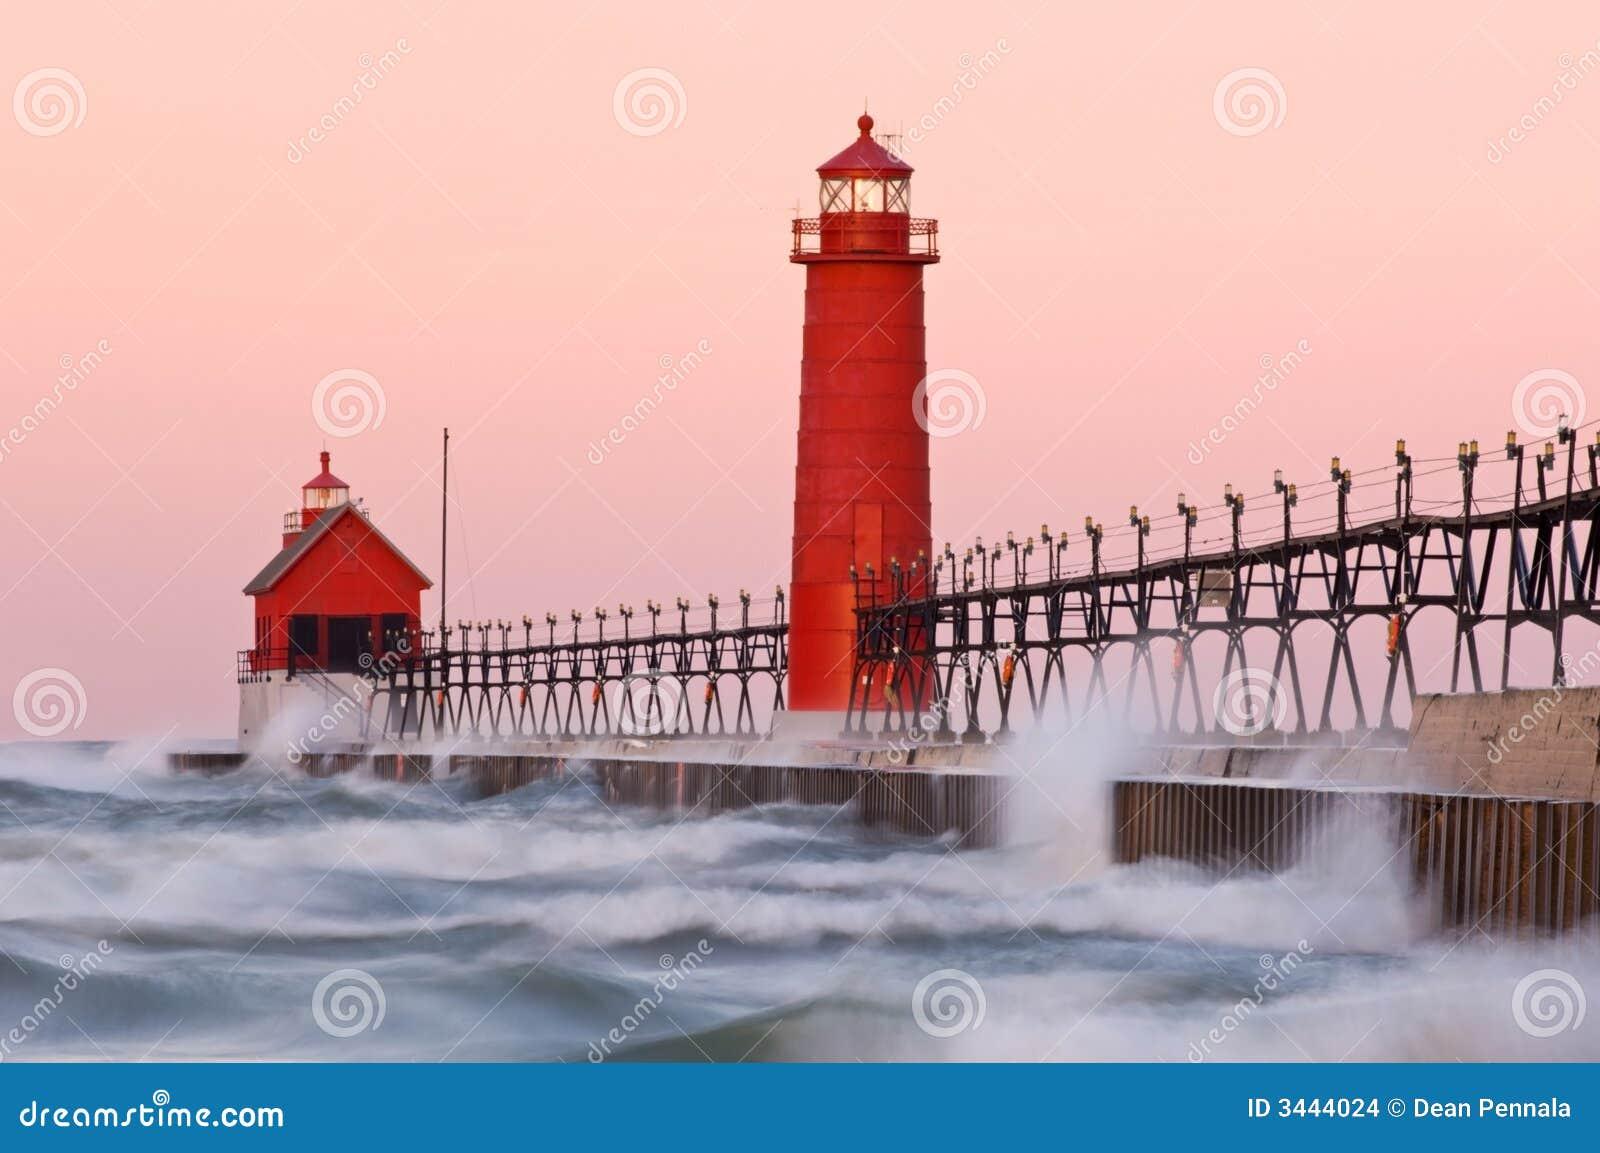 grand haven lighthouse stock photo image of pier. Black Bedroom Furniture Sets. Home Design Ideas